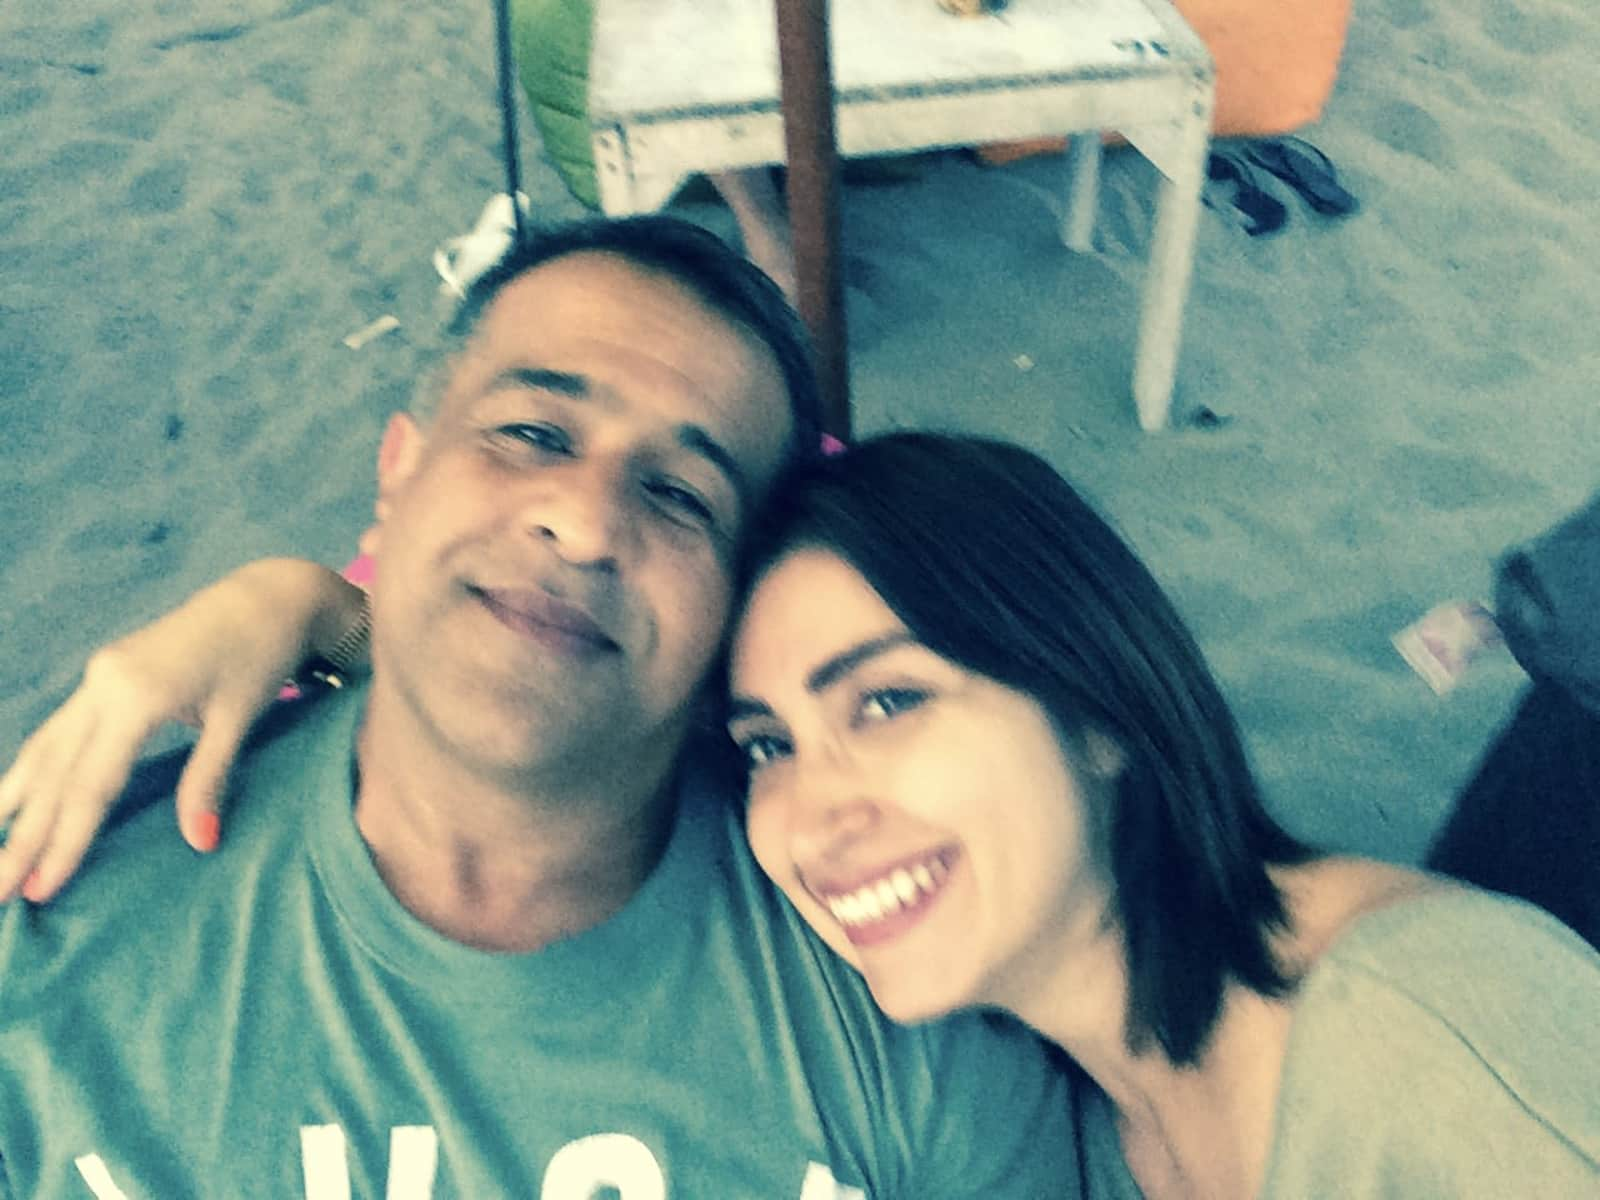 Katalia & Omar from New York City, New York, United States